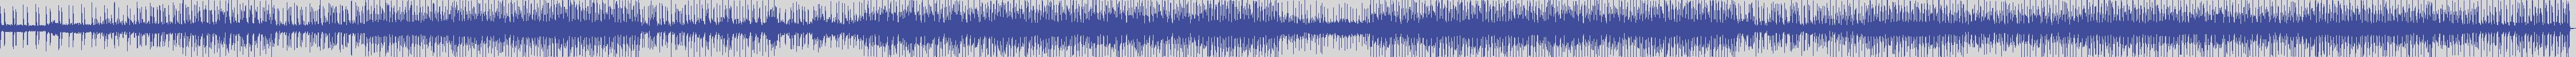 mbg_international_records [MBG116] MBG - Ore NoveNove [Original Mix] audio wave form